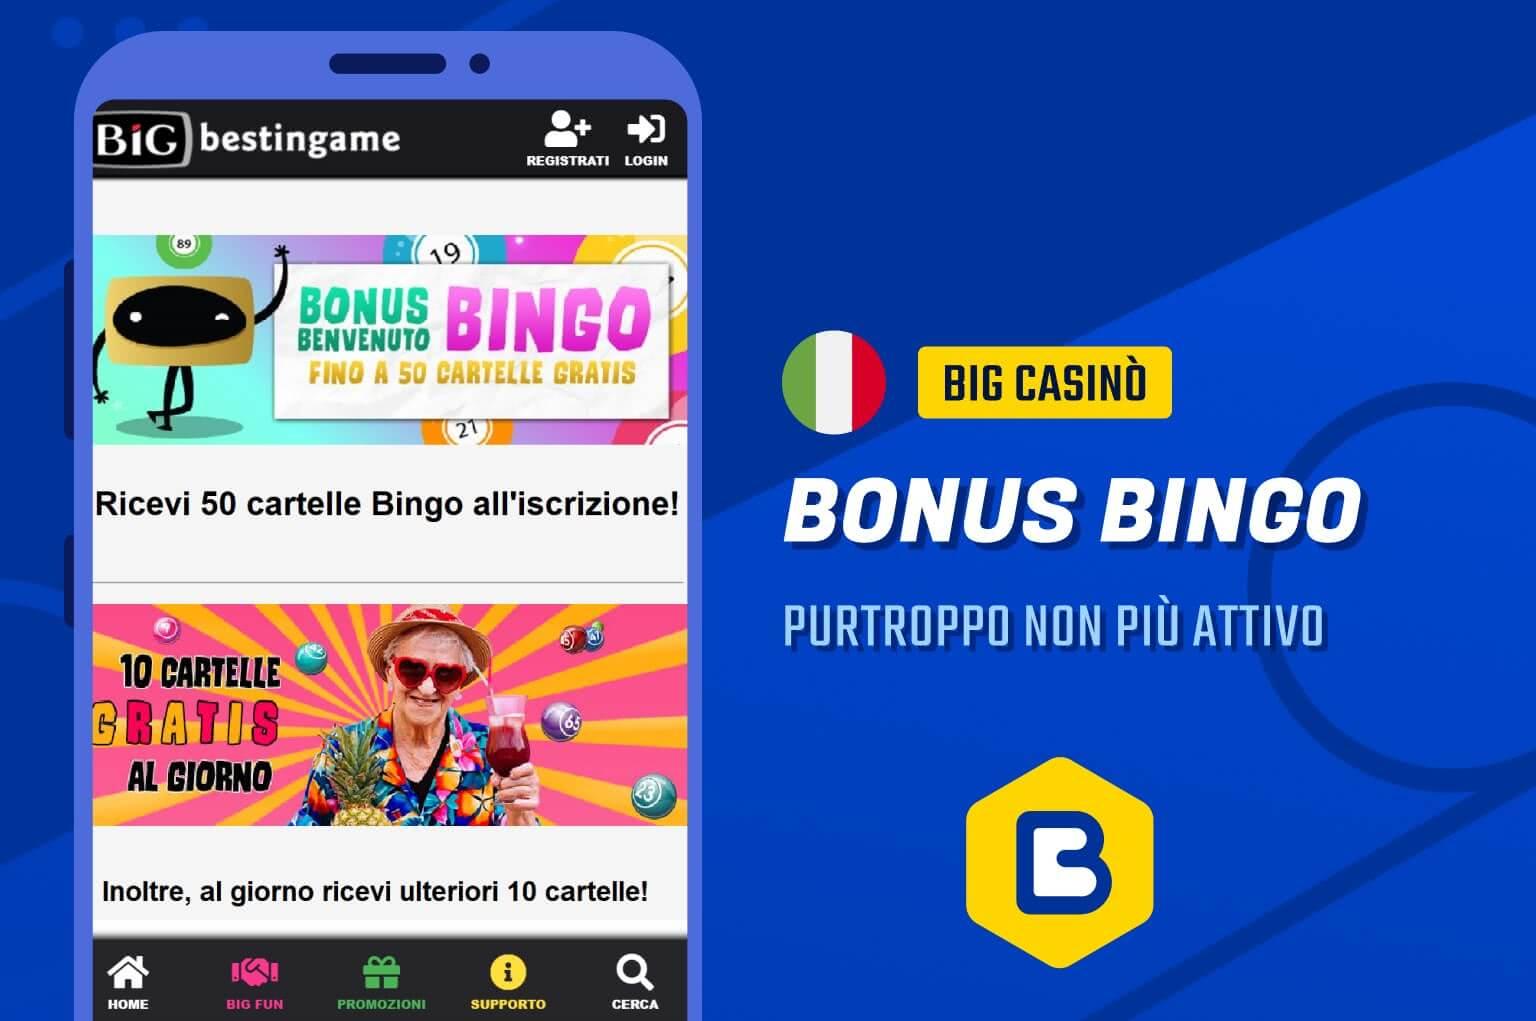 BIG casinò bingo